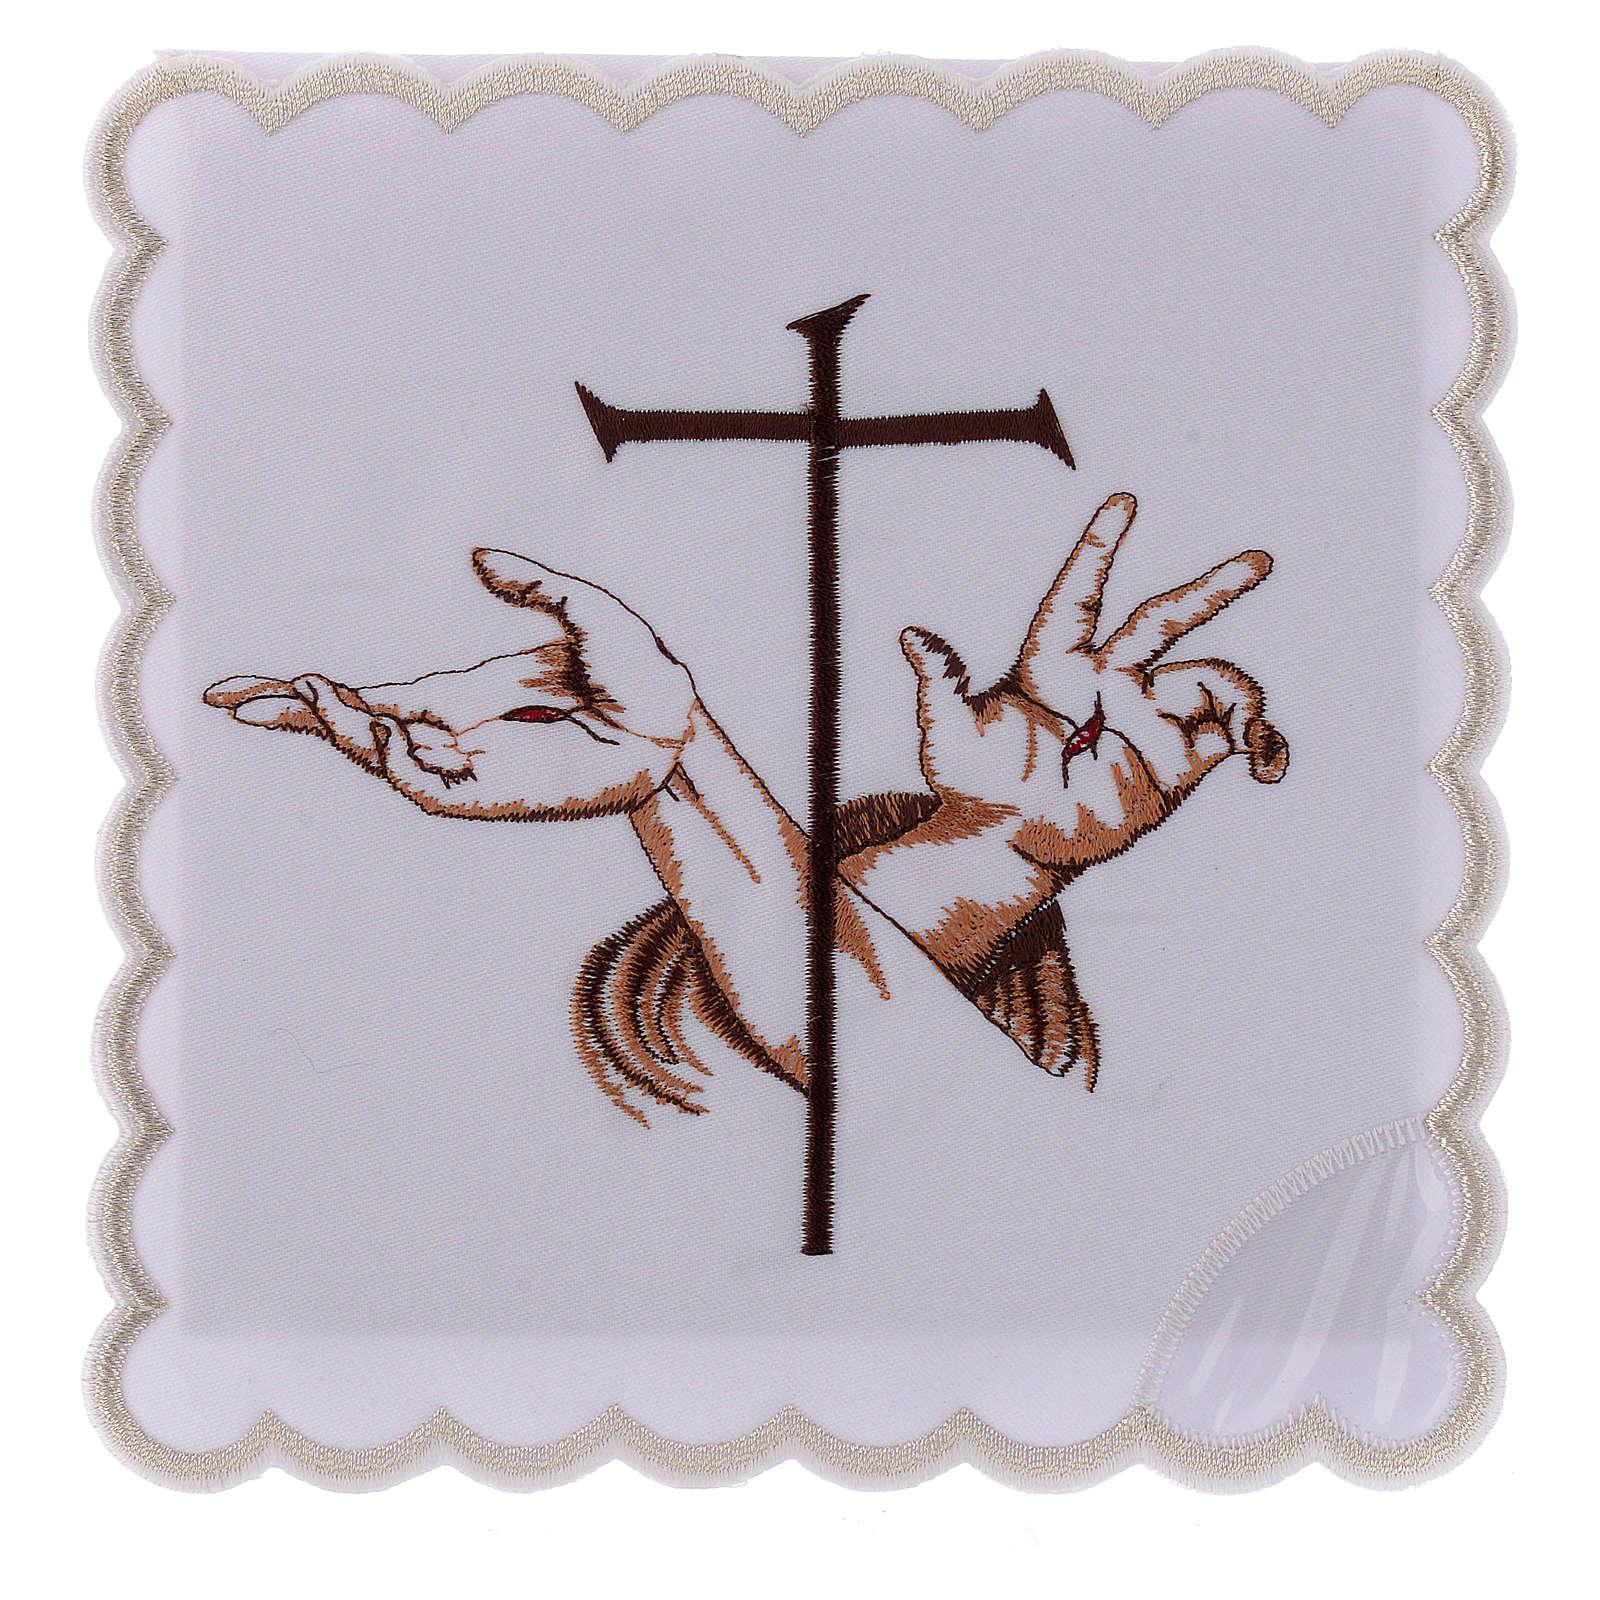 Altar linen Stigmata hands of Jesus & Cross, cotton 4